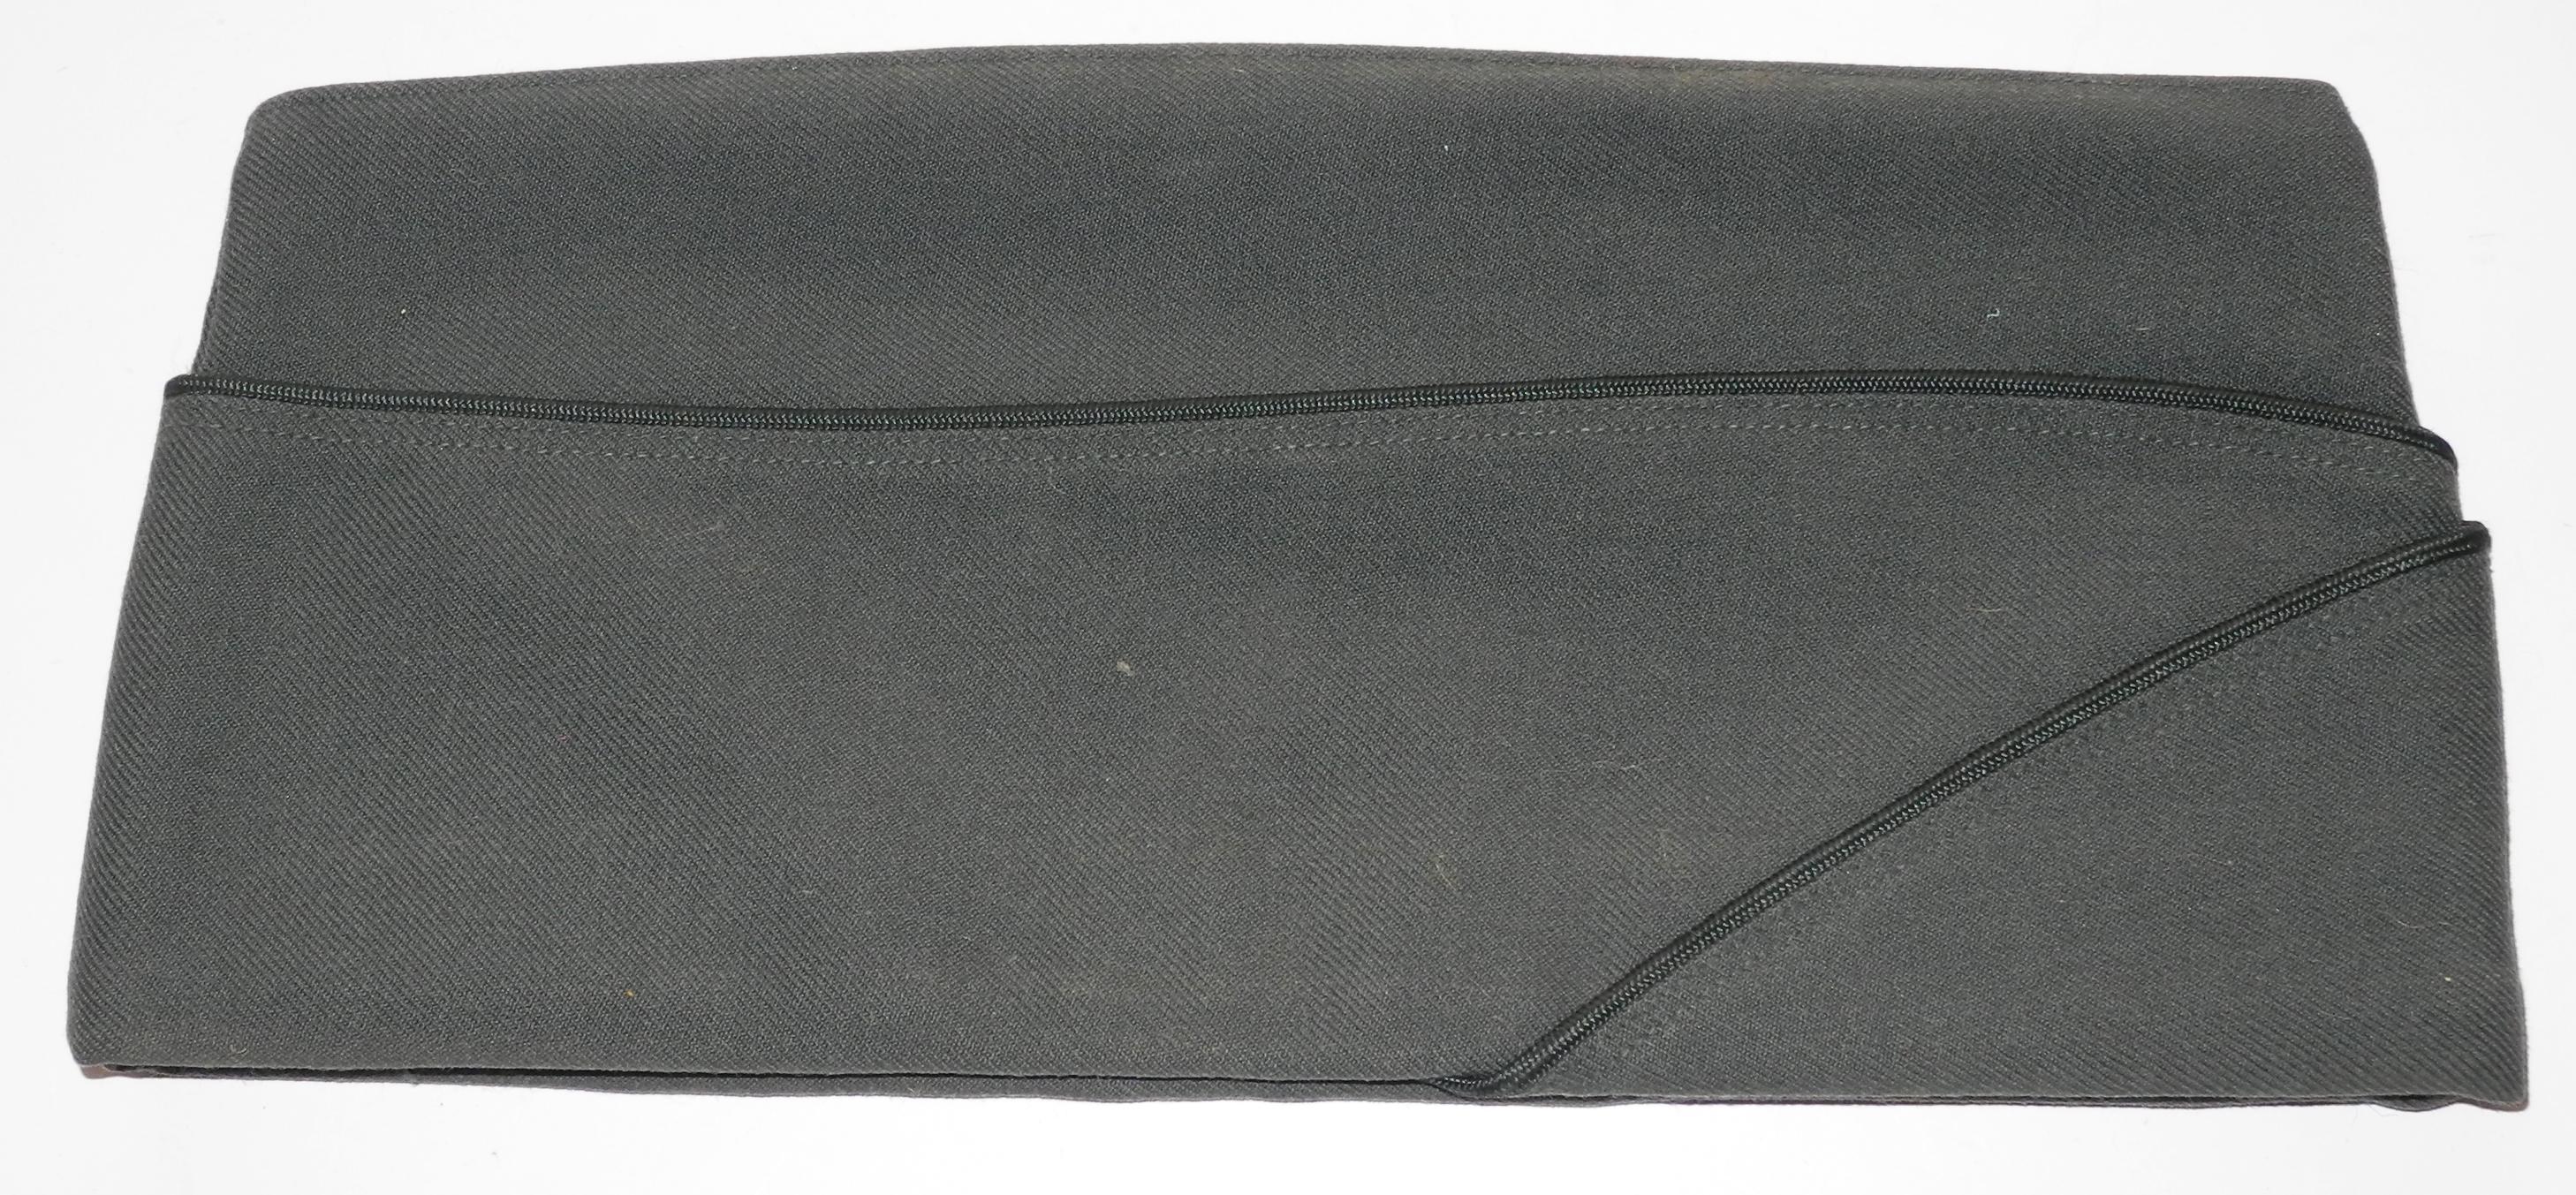 1960s US Army Airborne overseas cap